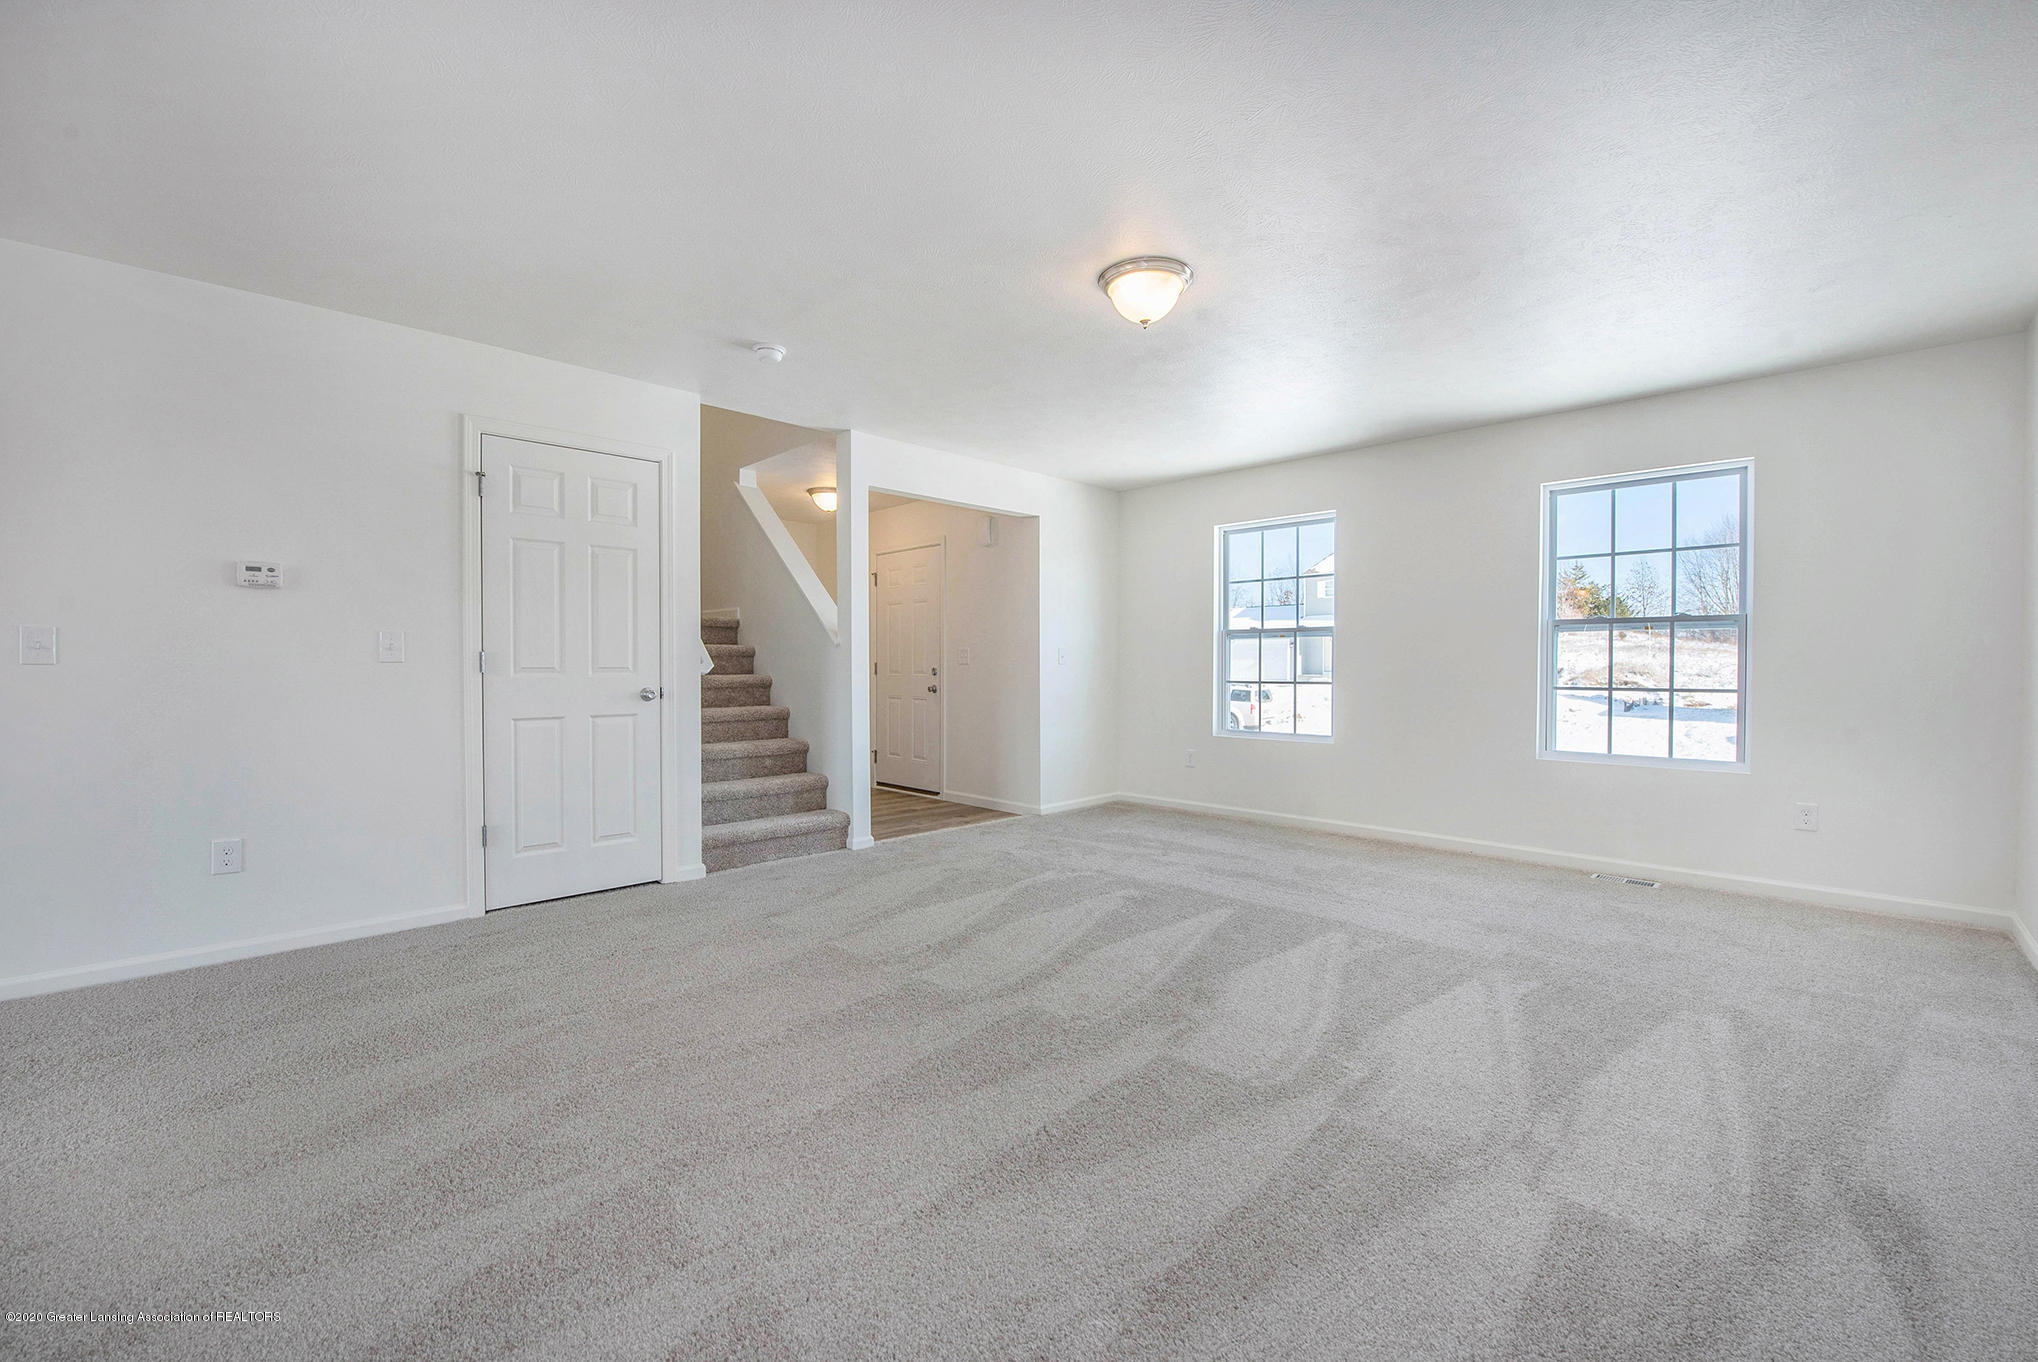 1114 River Oaks Dr - GVH073-i1830-Great Room1 - 6